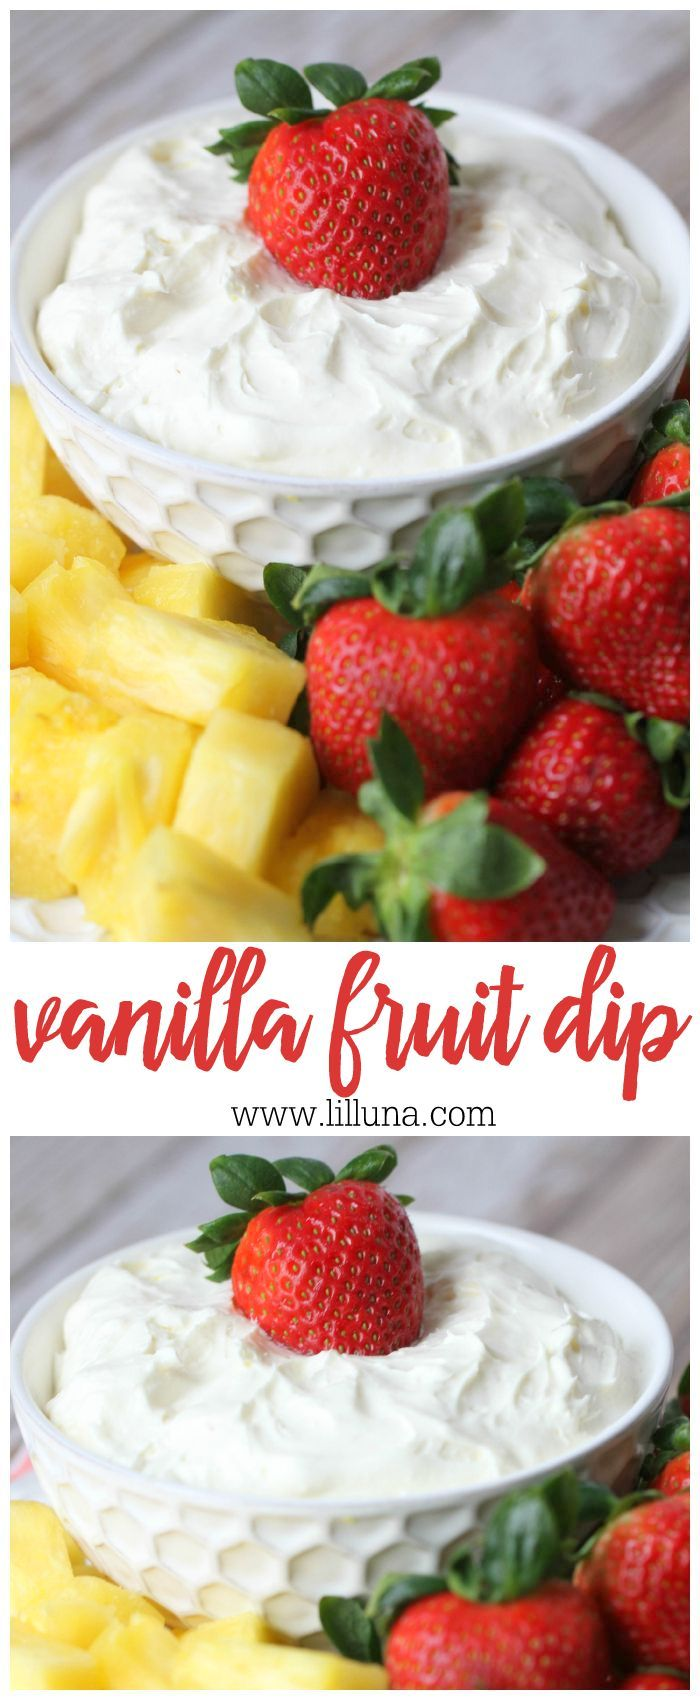 Vanilla Fruit Dip